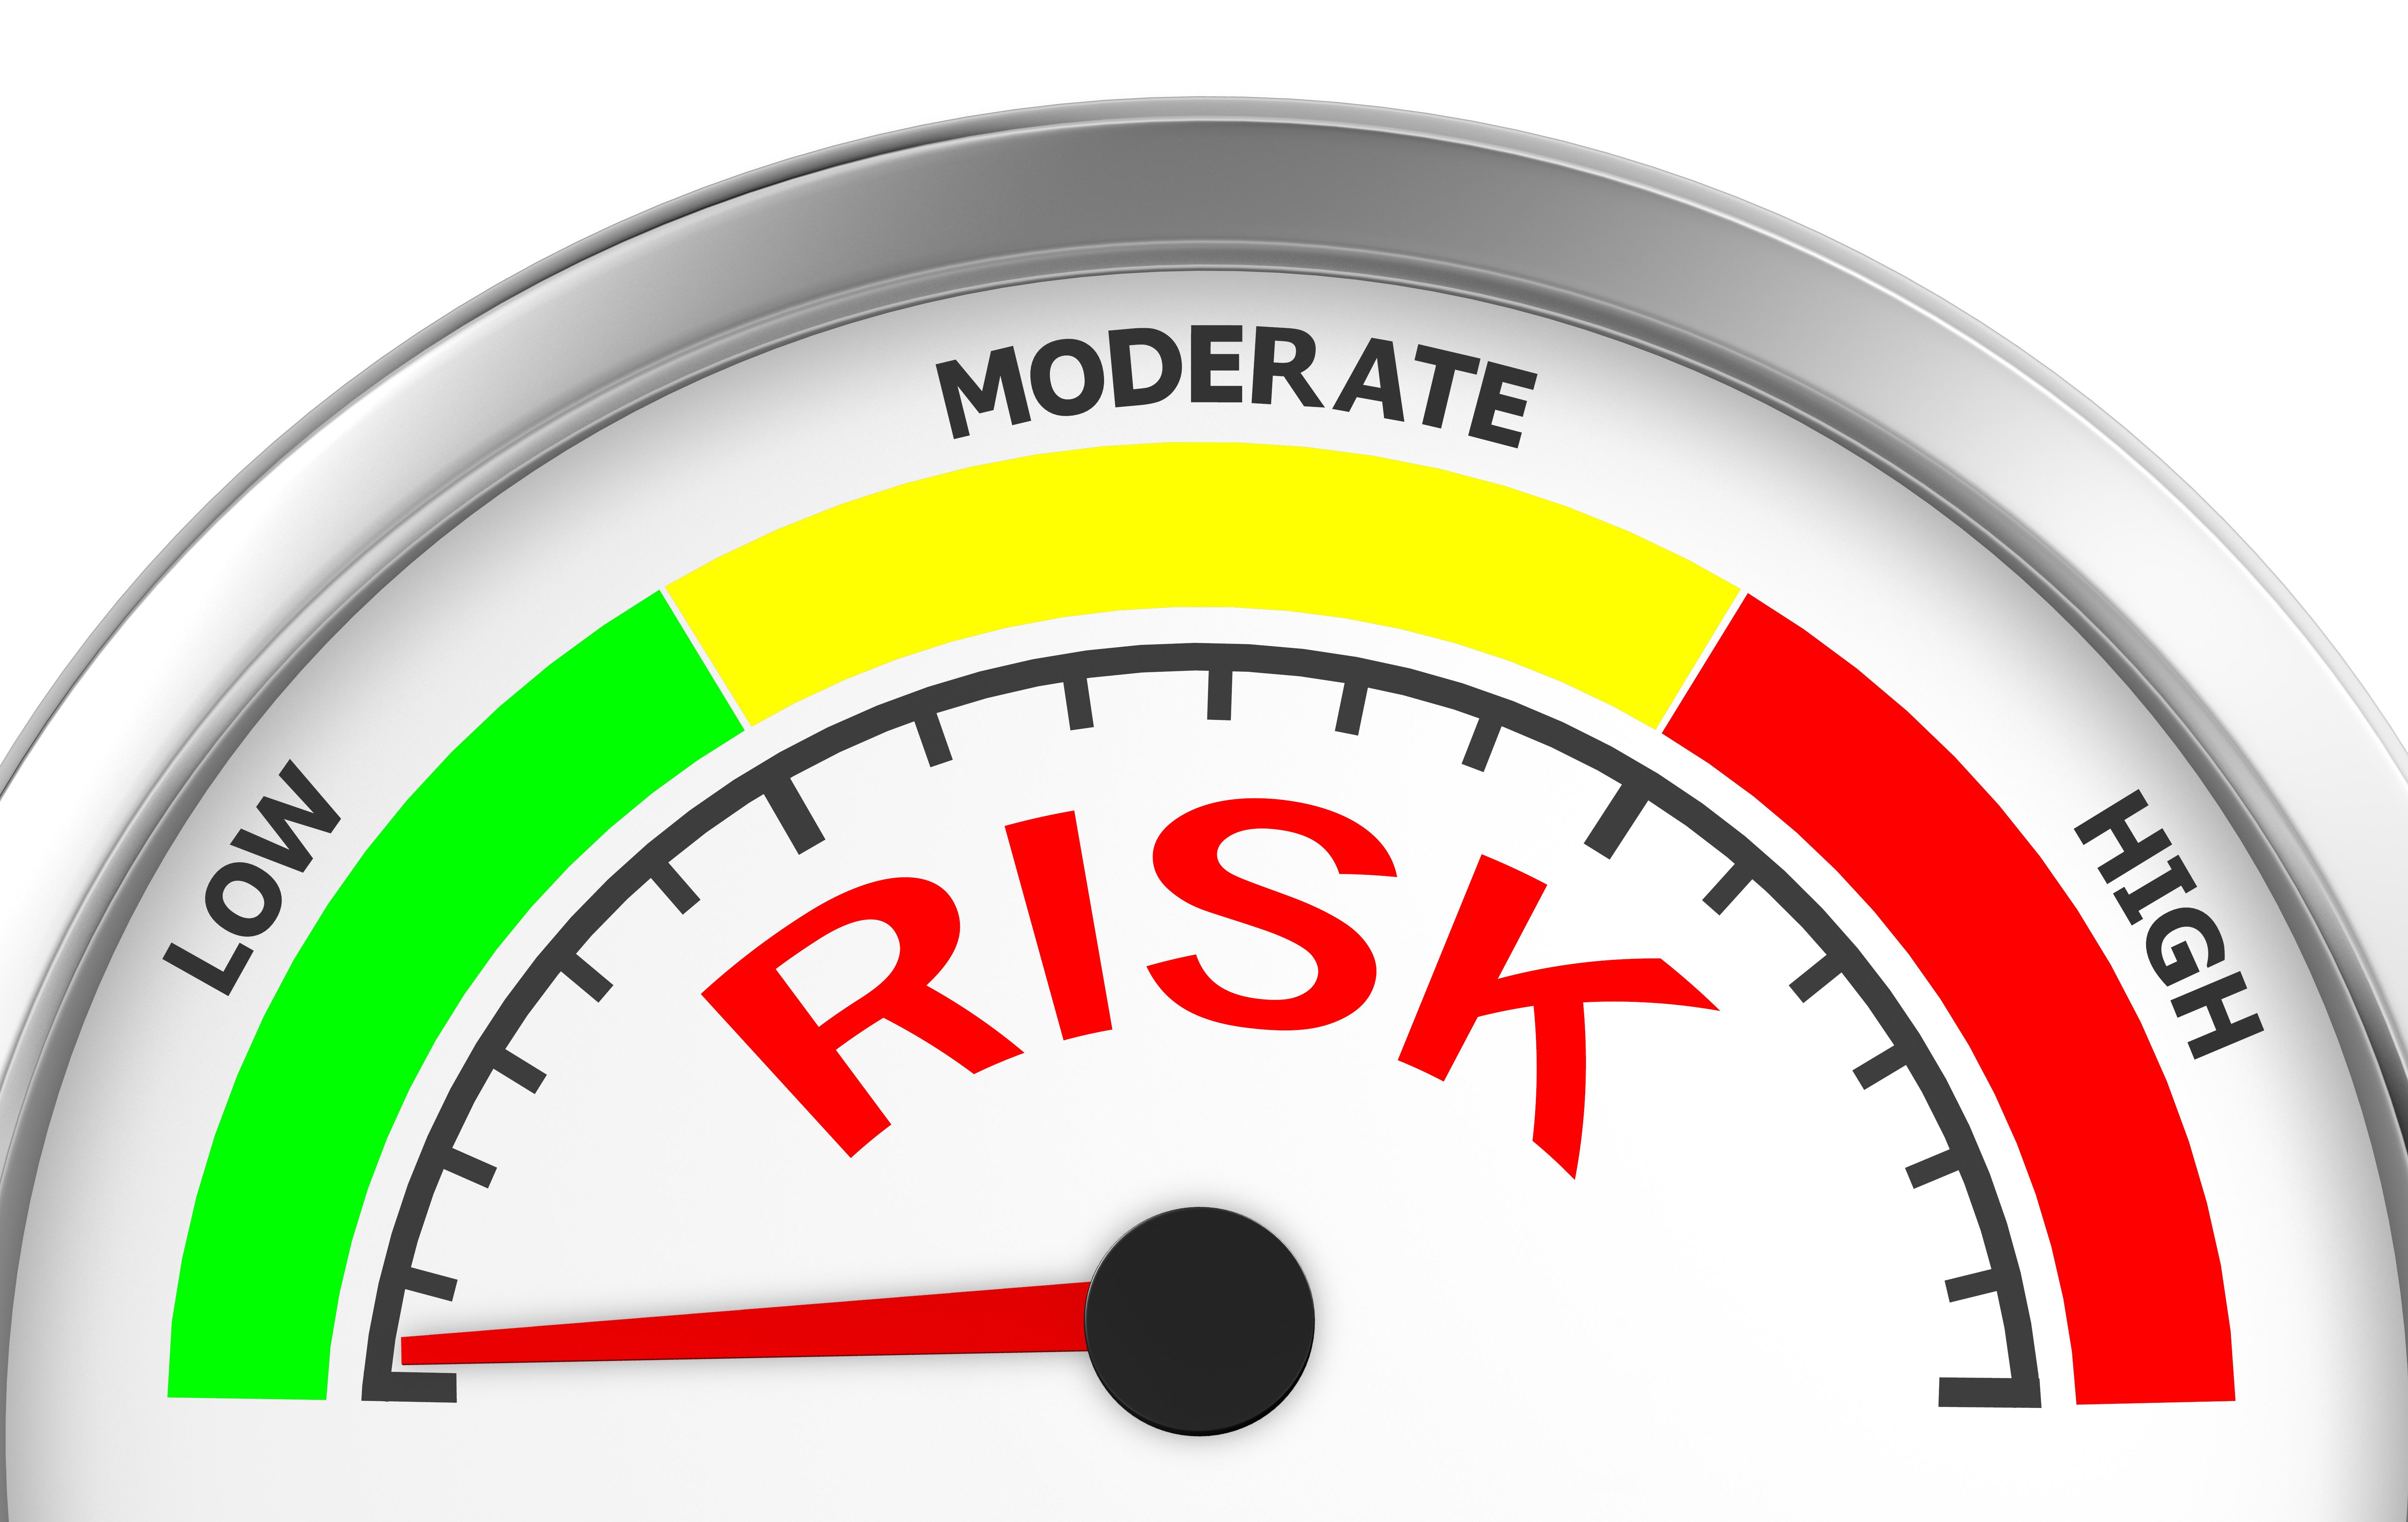 Risk meter reading low.